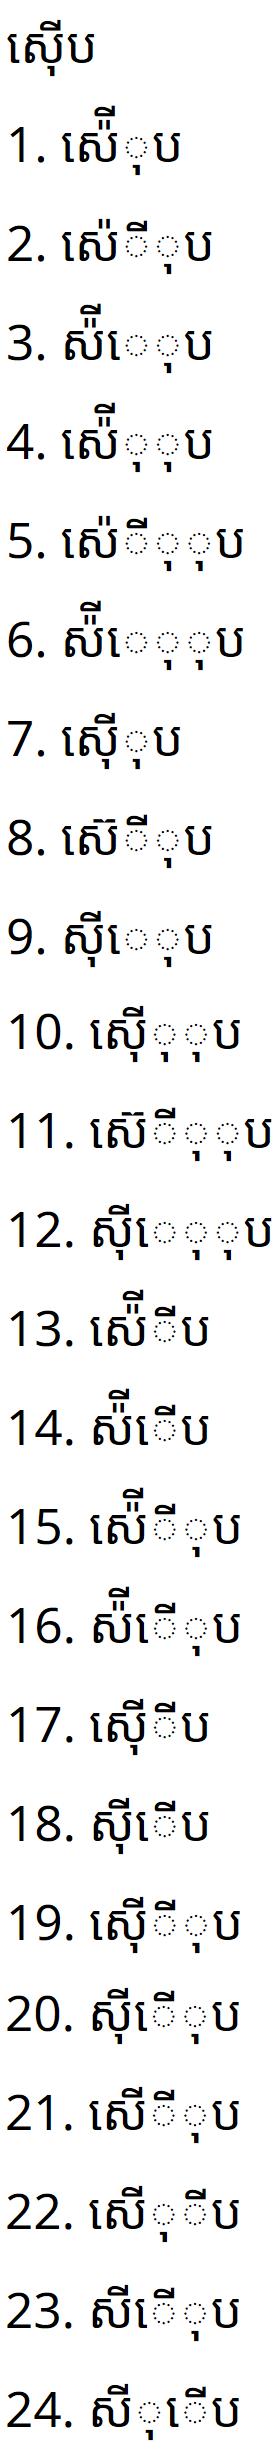 khmer_seep_textedit_win10_edge